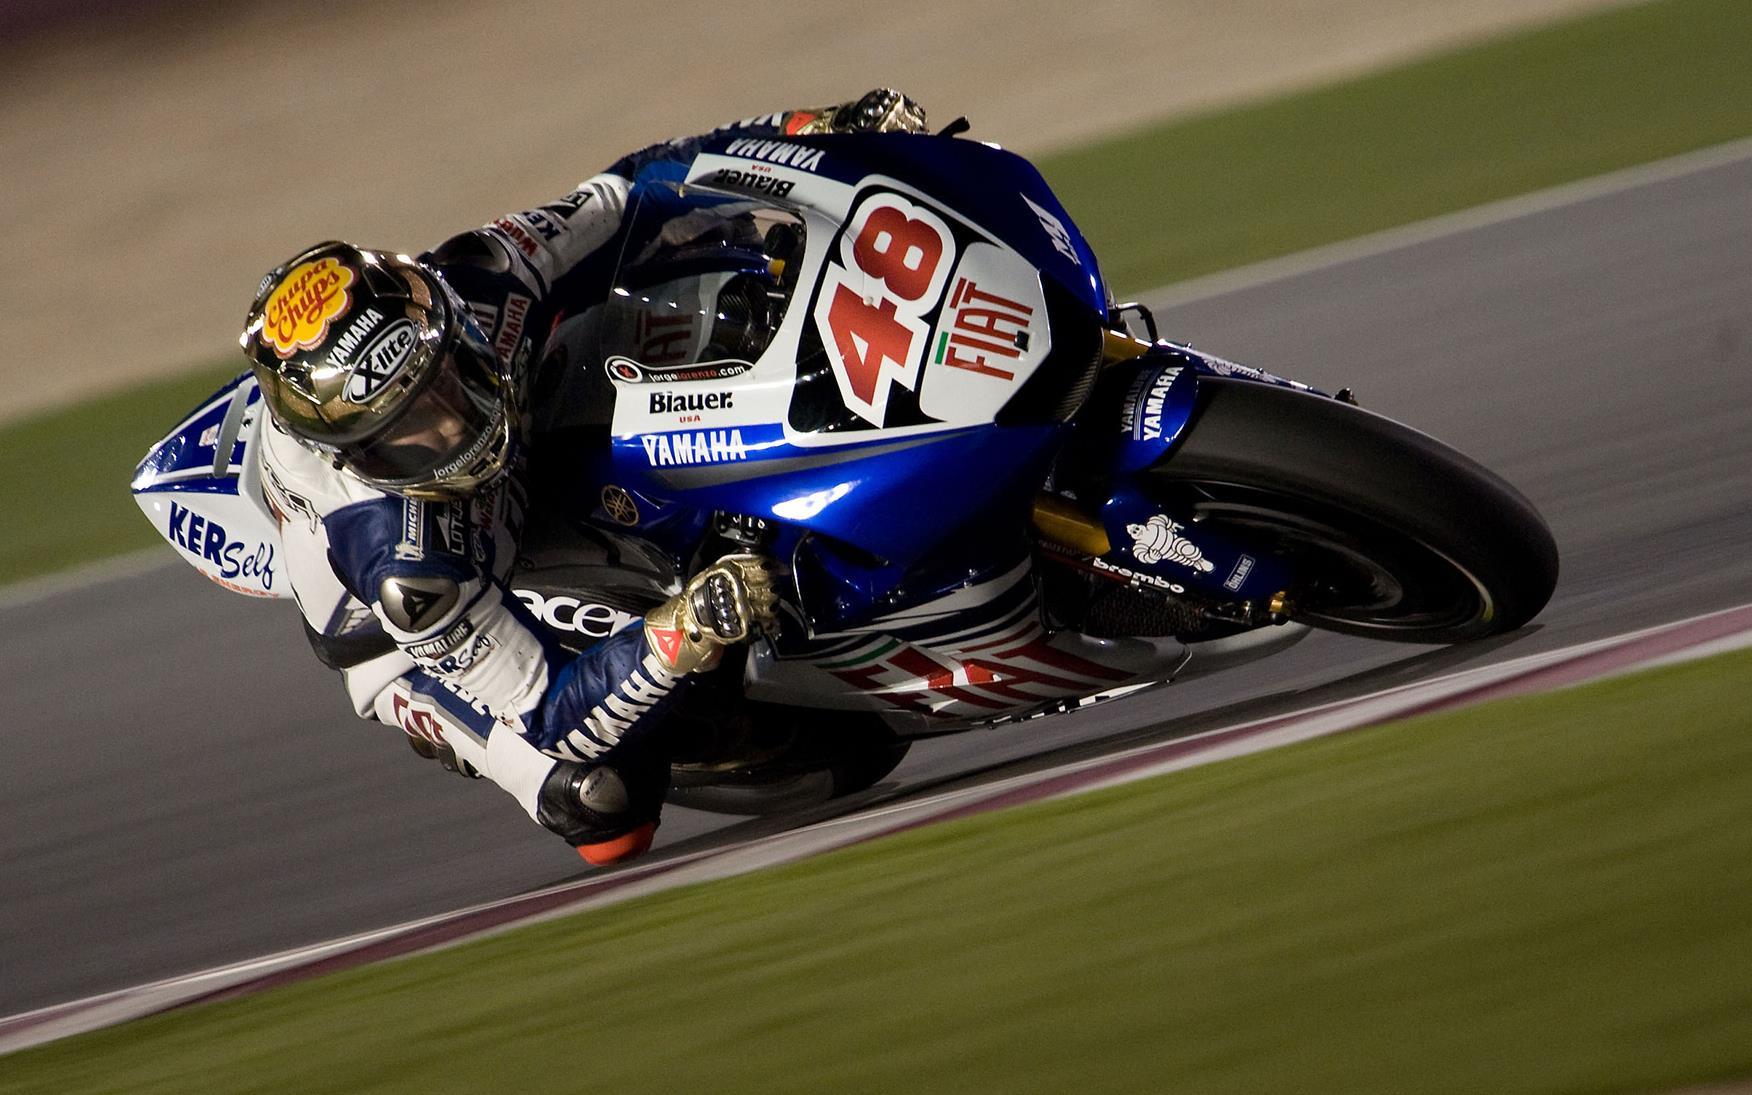 Qatar MotoGP: Valentino Rossi wary of premier class rookies